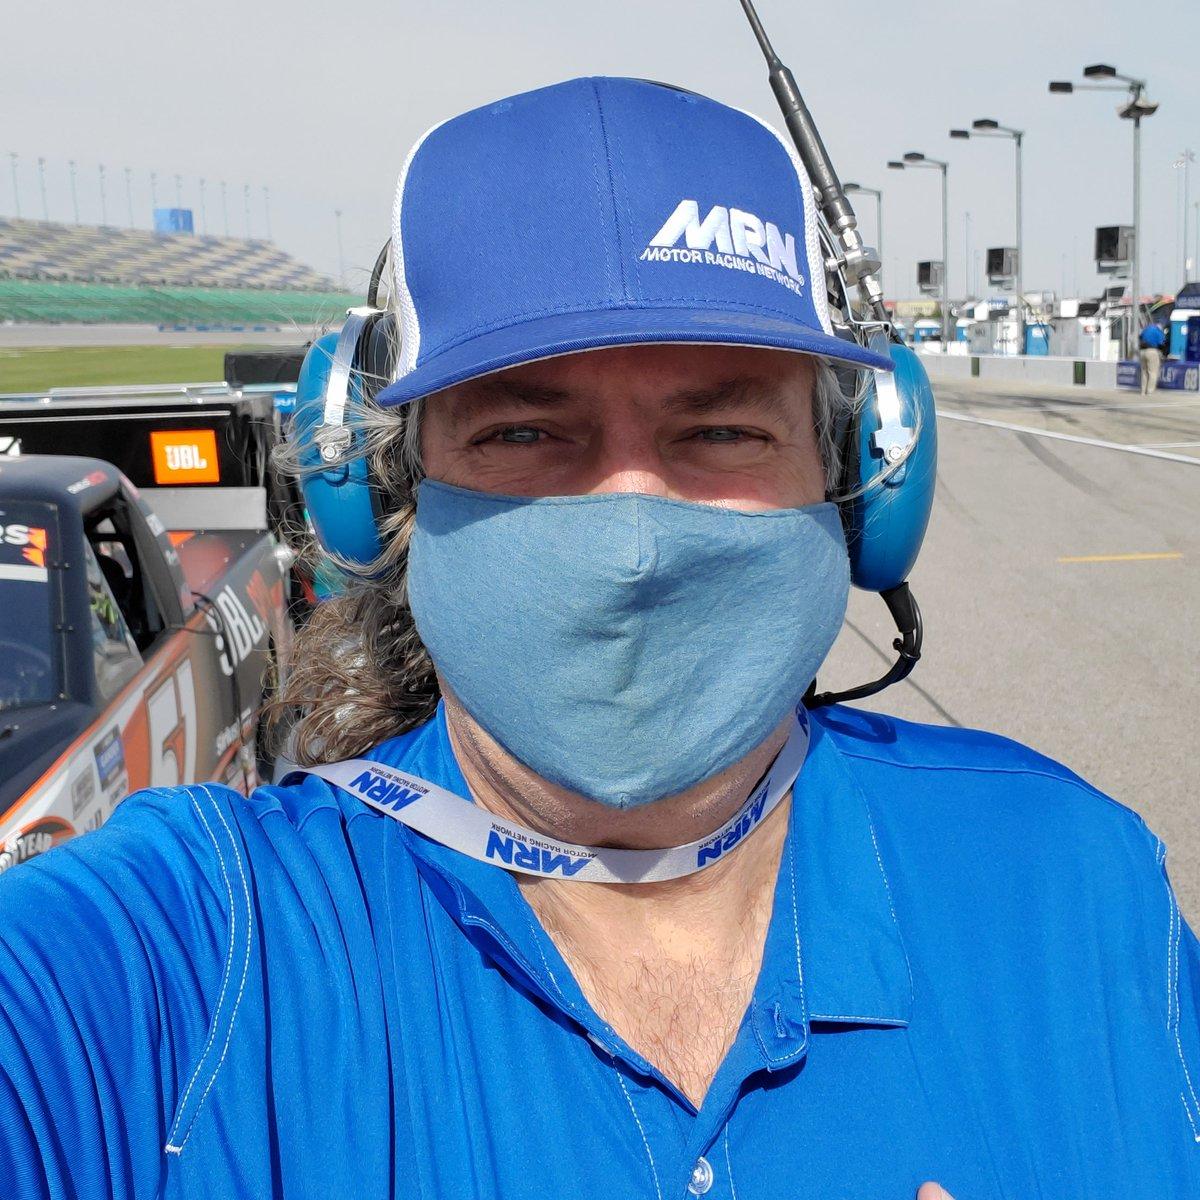 First Up! @NASCAR_Trucks on @MRNRadio ....3:30 et #AskMRN